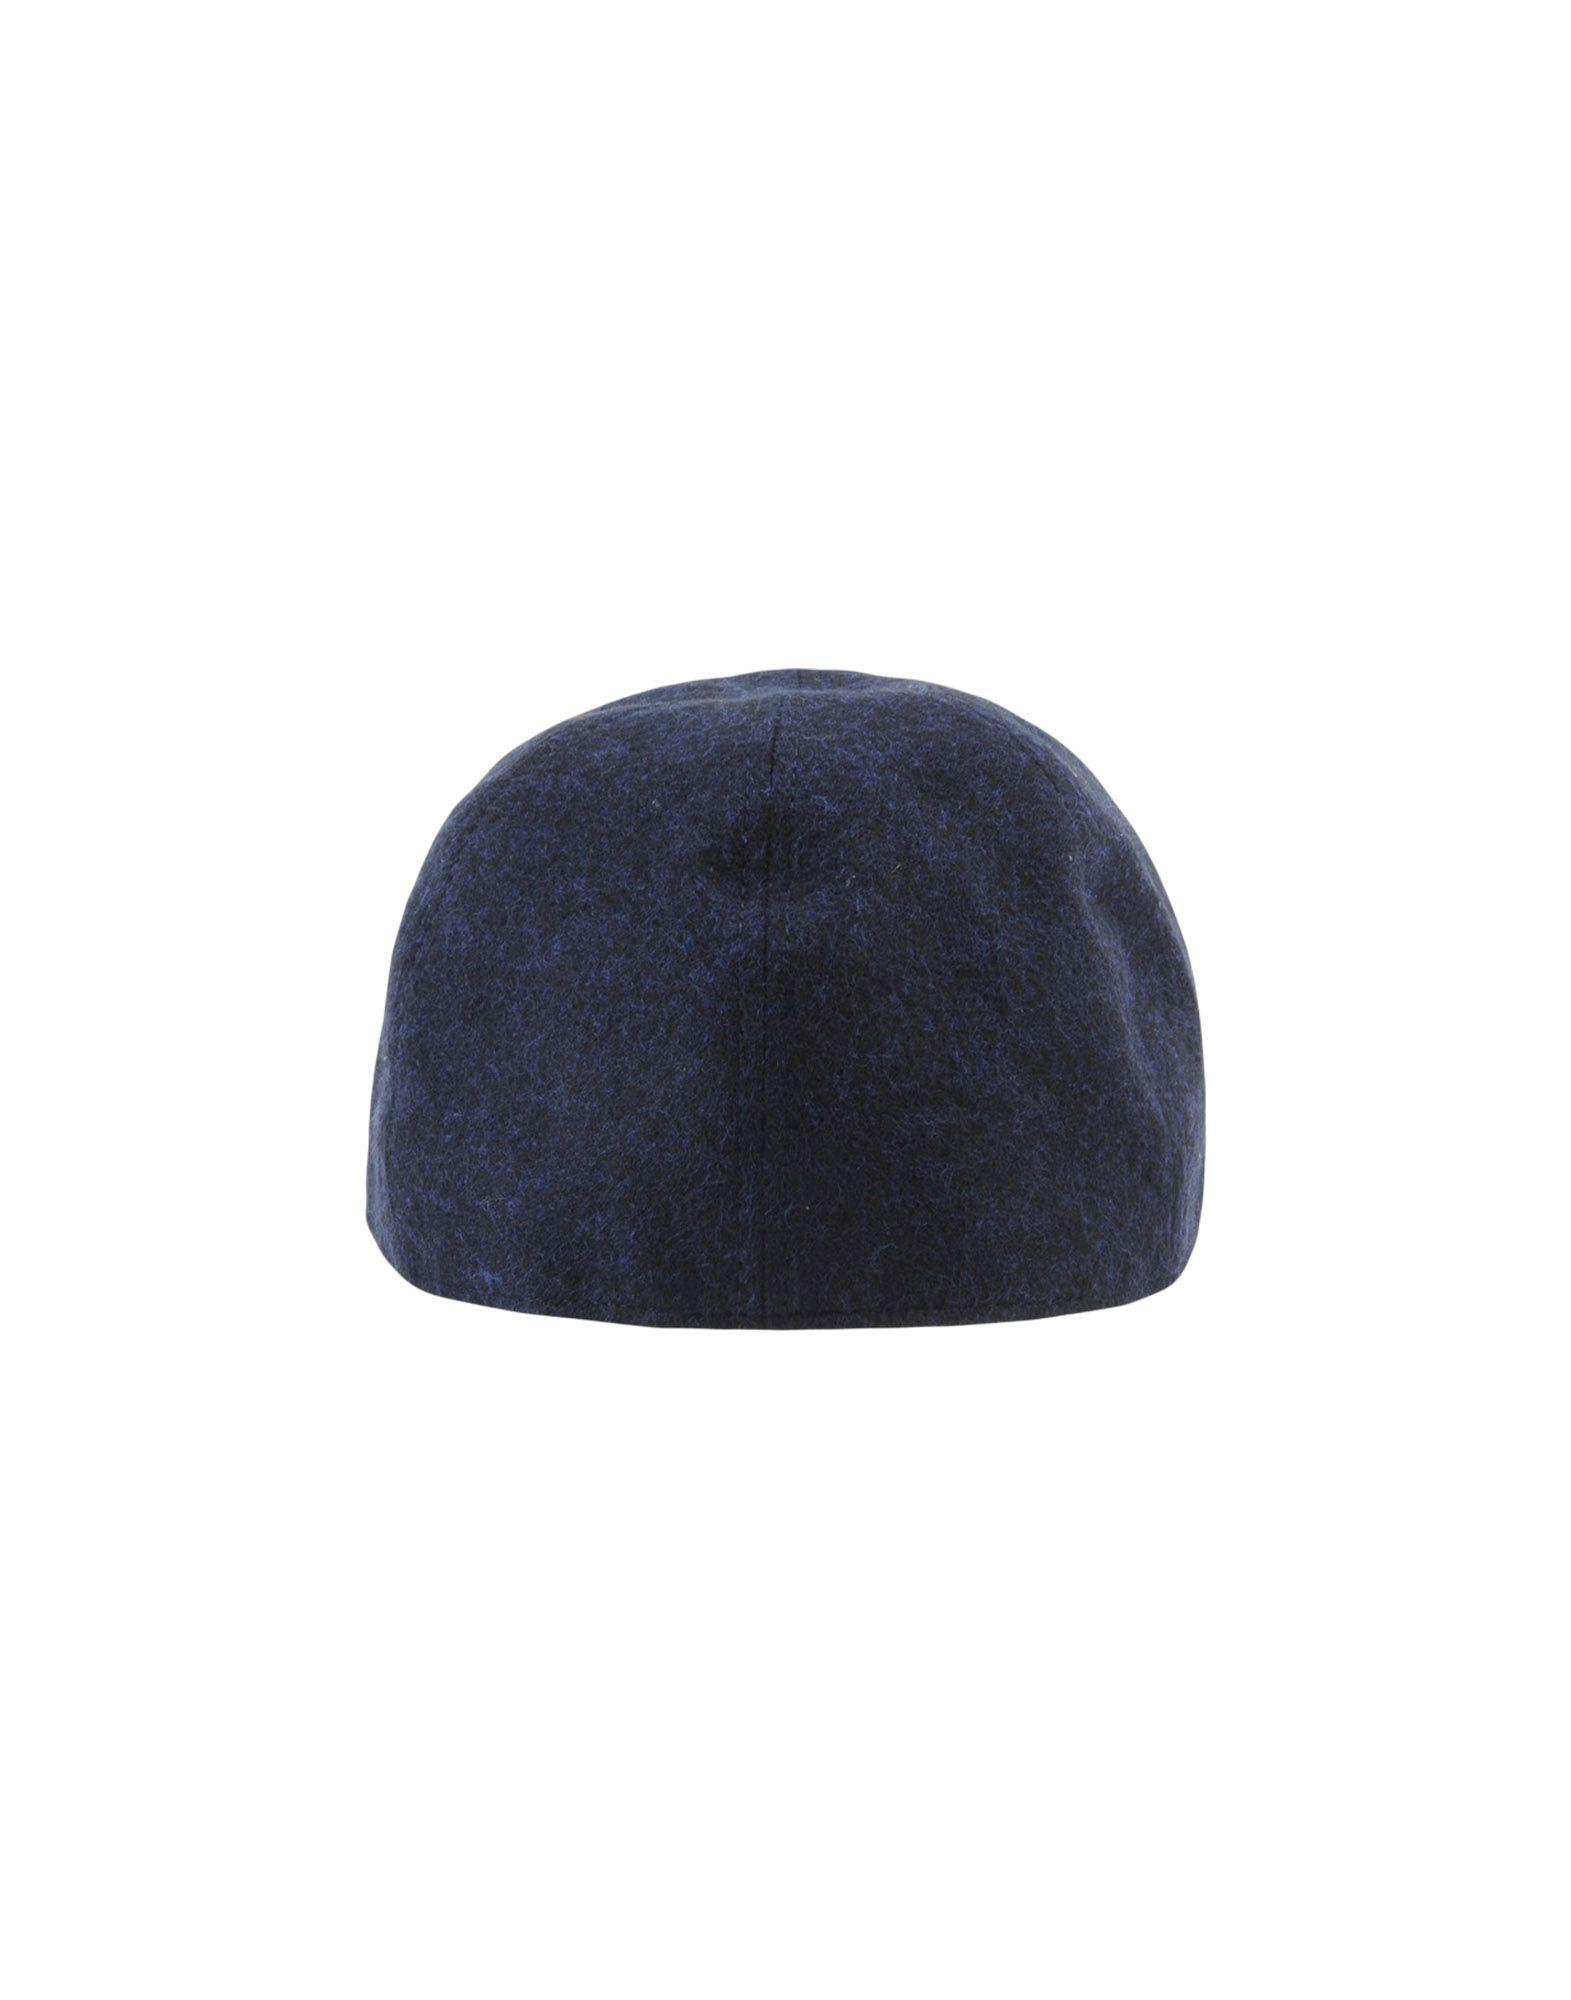 d09c29b9374 Lyst - Emporio Armani Hat in Blue for Men